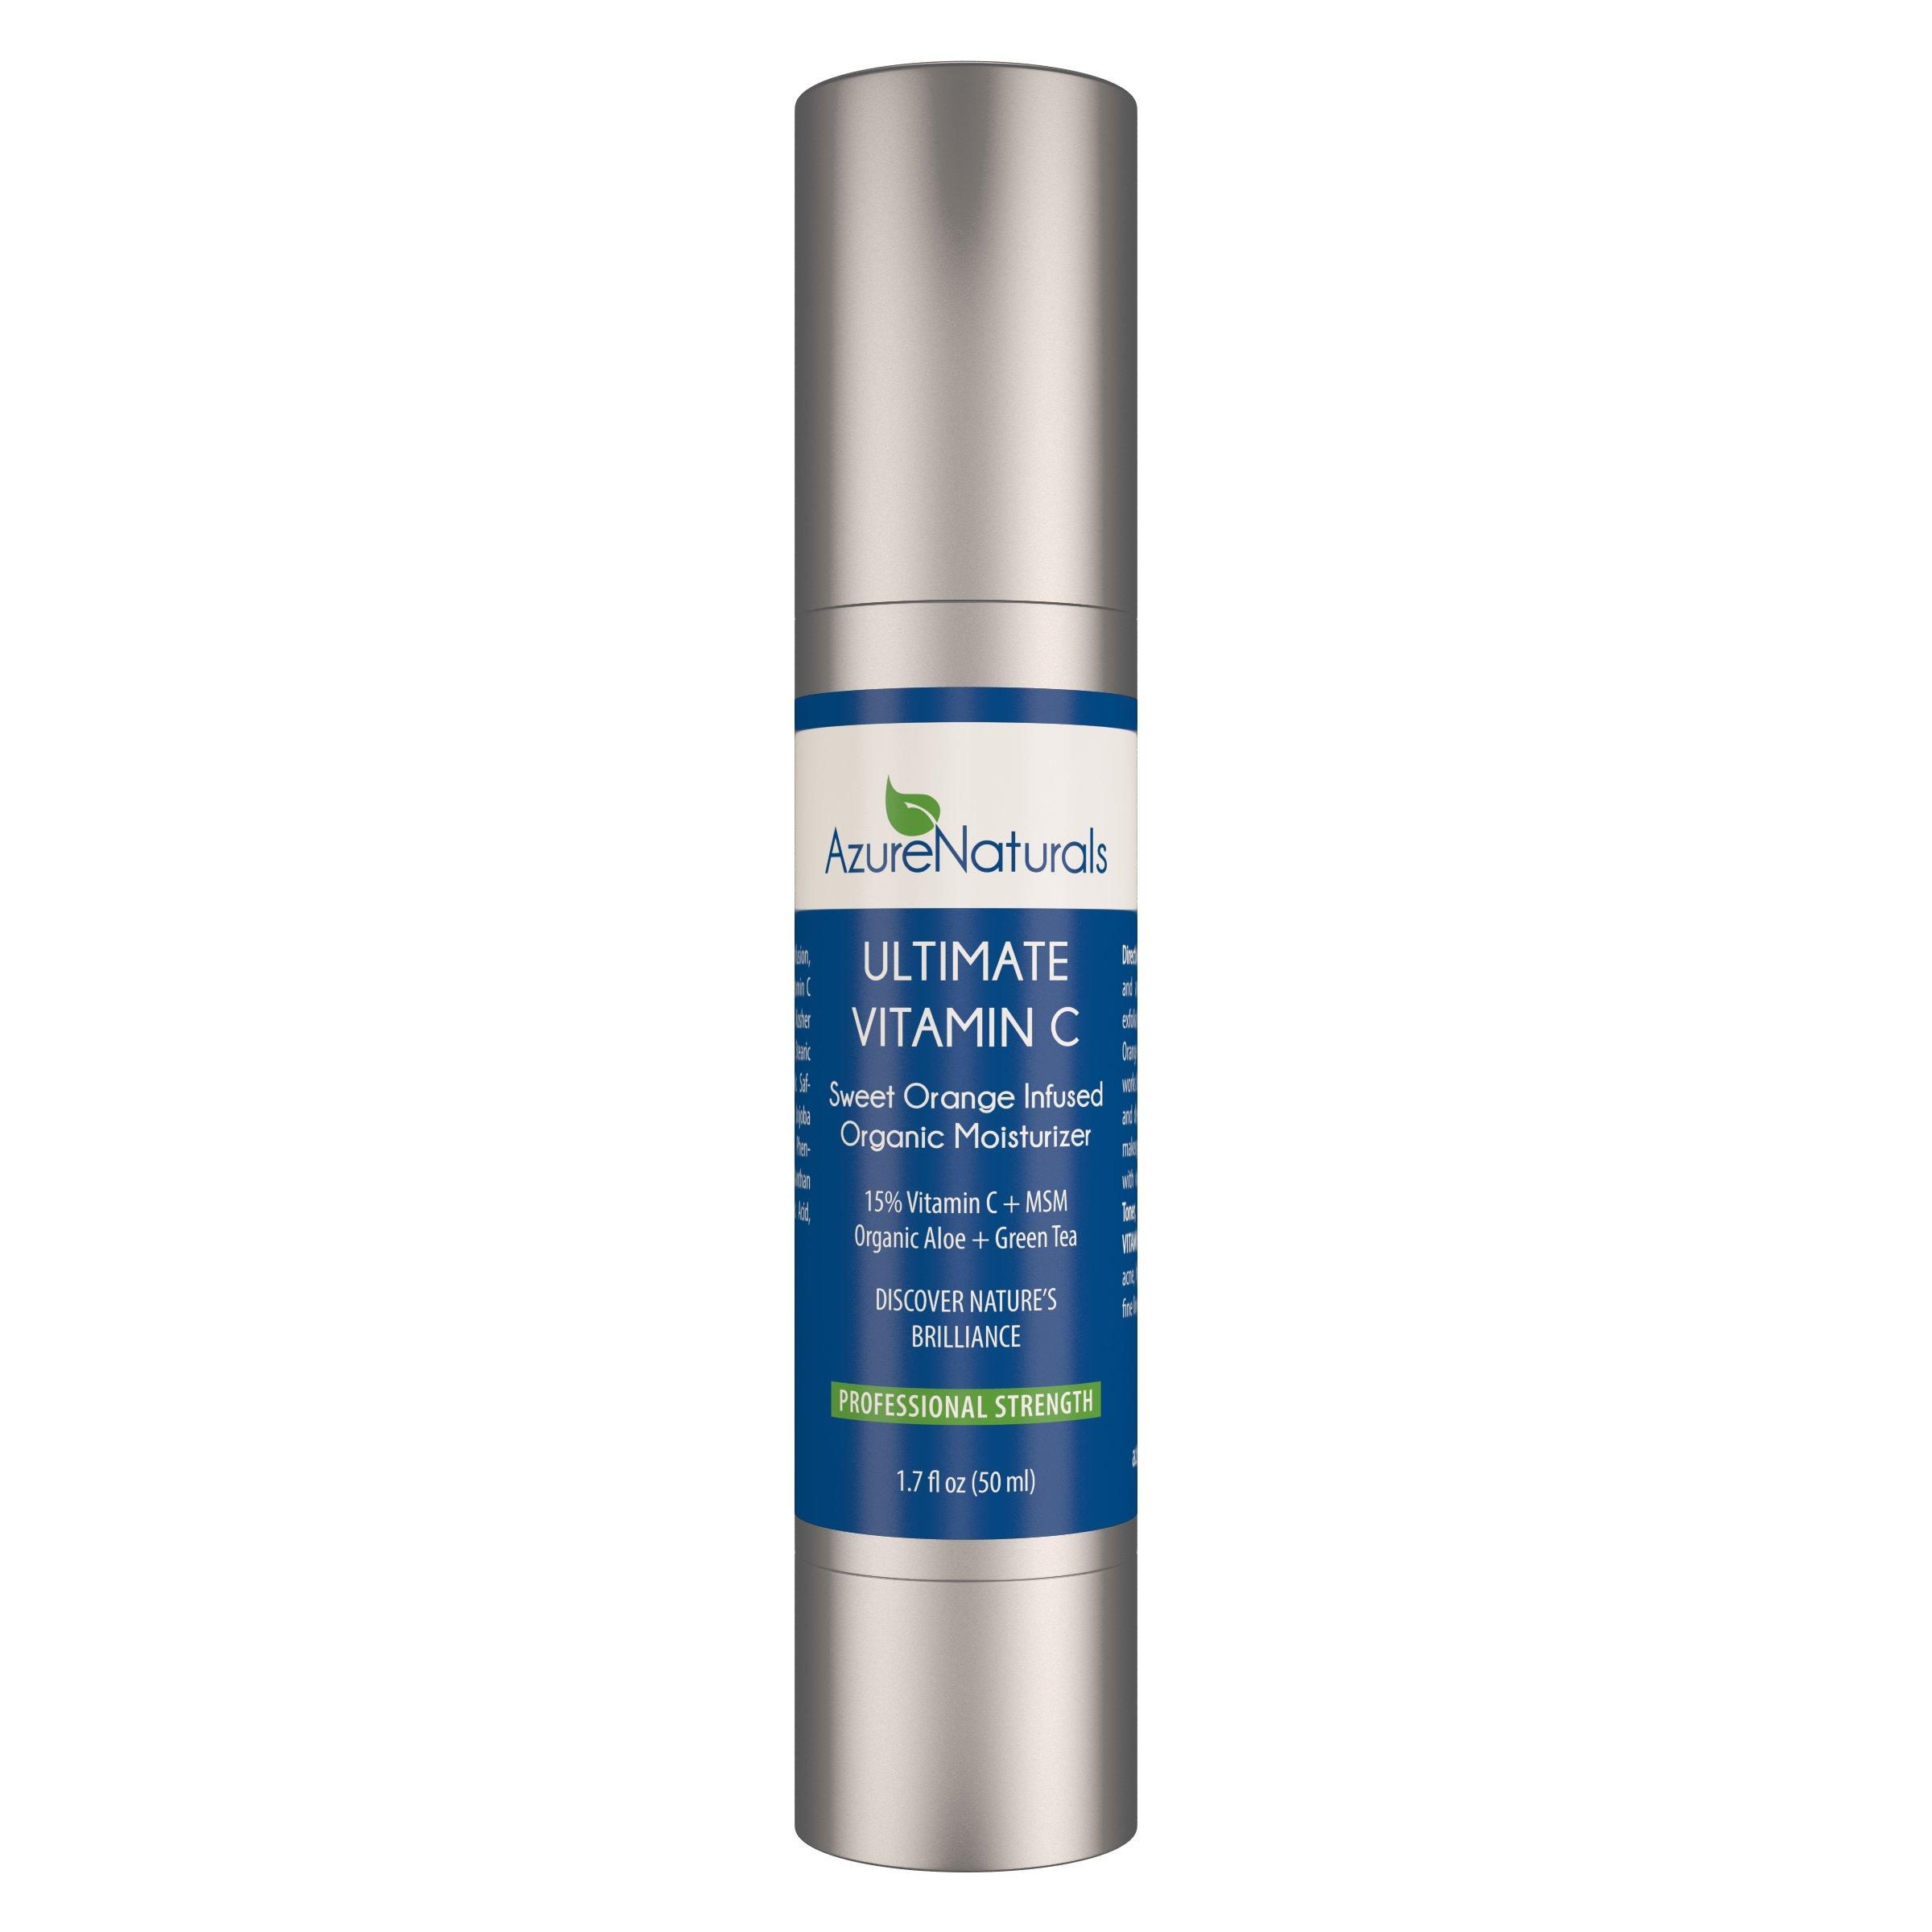 SWEET ORANGE 15% VITAMIN C Organic Facial Moisturizer, New Advanced Anti Aging Formula Softens, Heals, & Protects Dry Skin, Best Natural Vitamin C Cream, Anti-Aging Organic Skin Care Product!